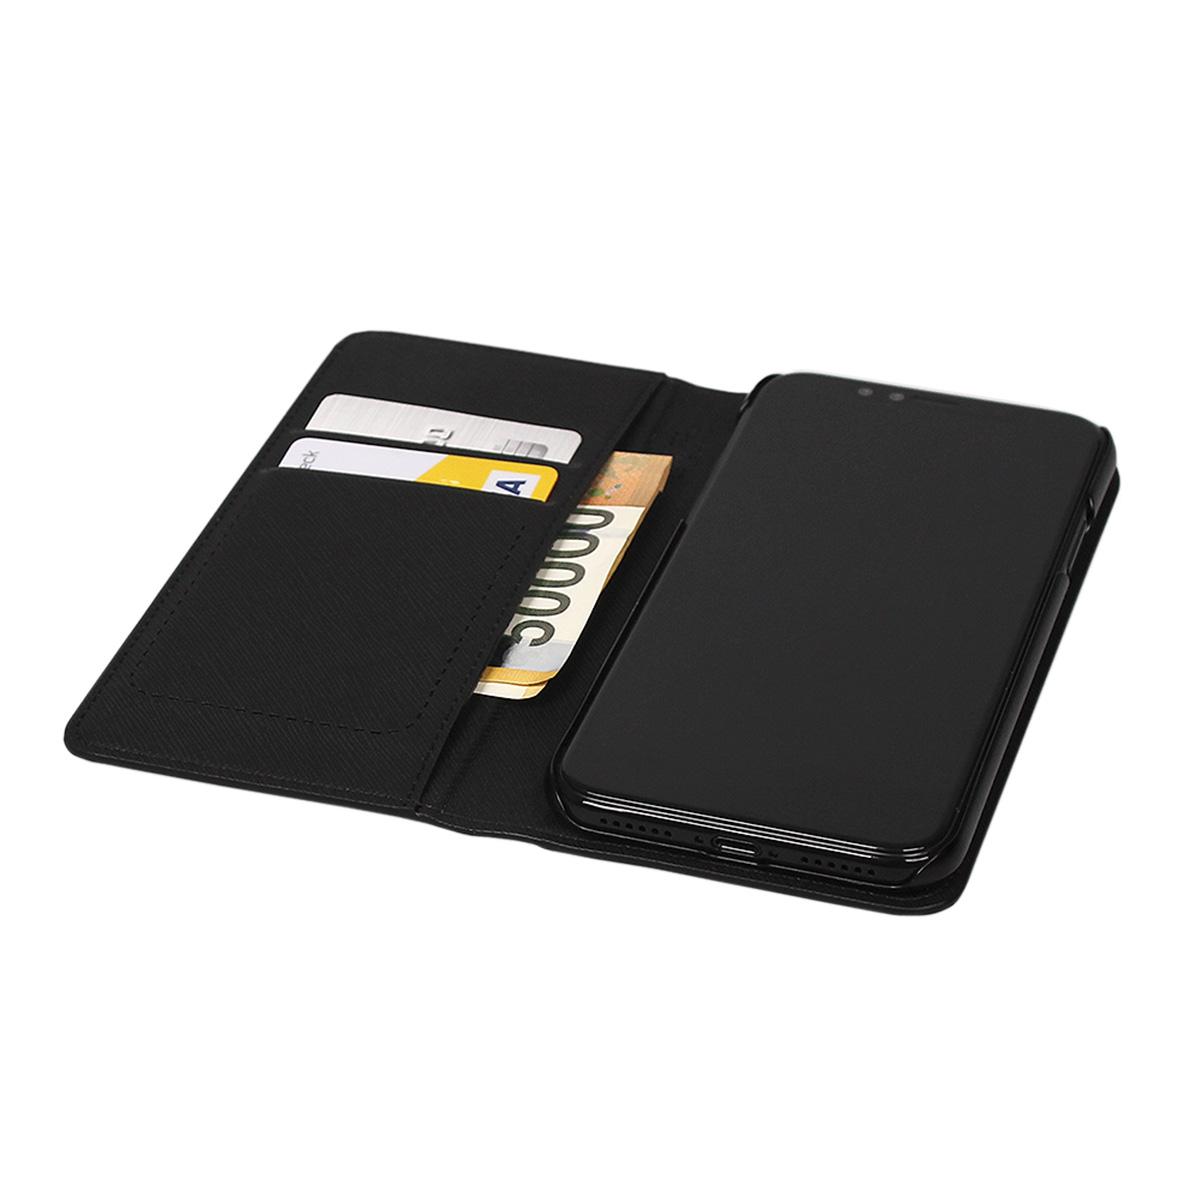 iPhone XS / X ケース iPhone XS Max ケース iPhone XR ケースSTI:L GENTLEMAN FLIP 手帳型 (スティール ジェントルマンフリップ)アイフォン カバー